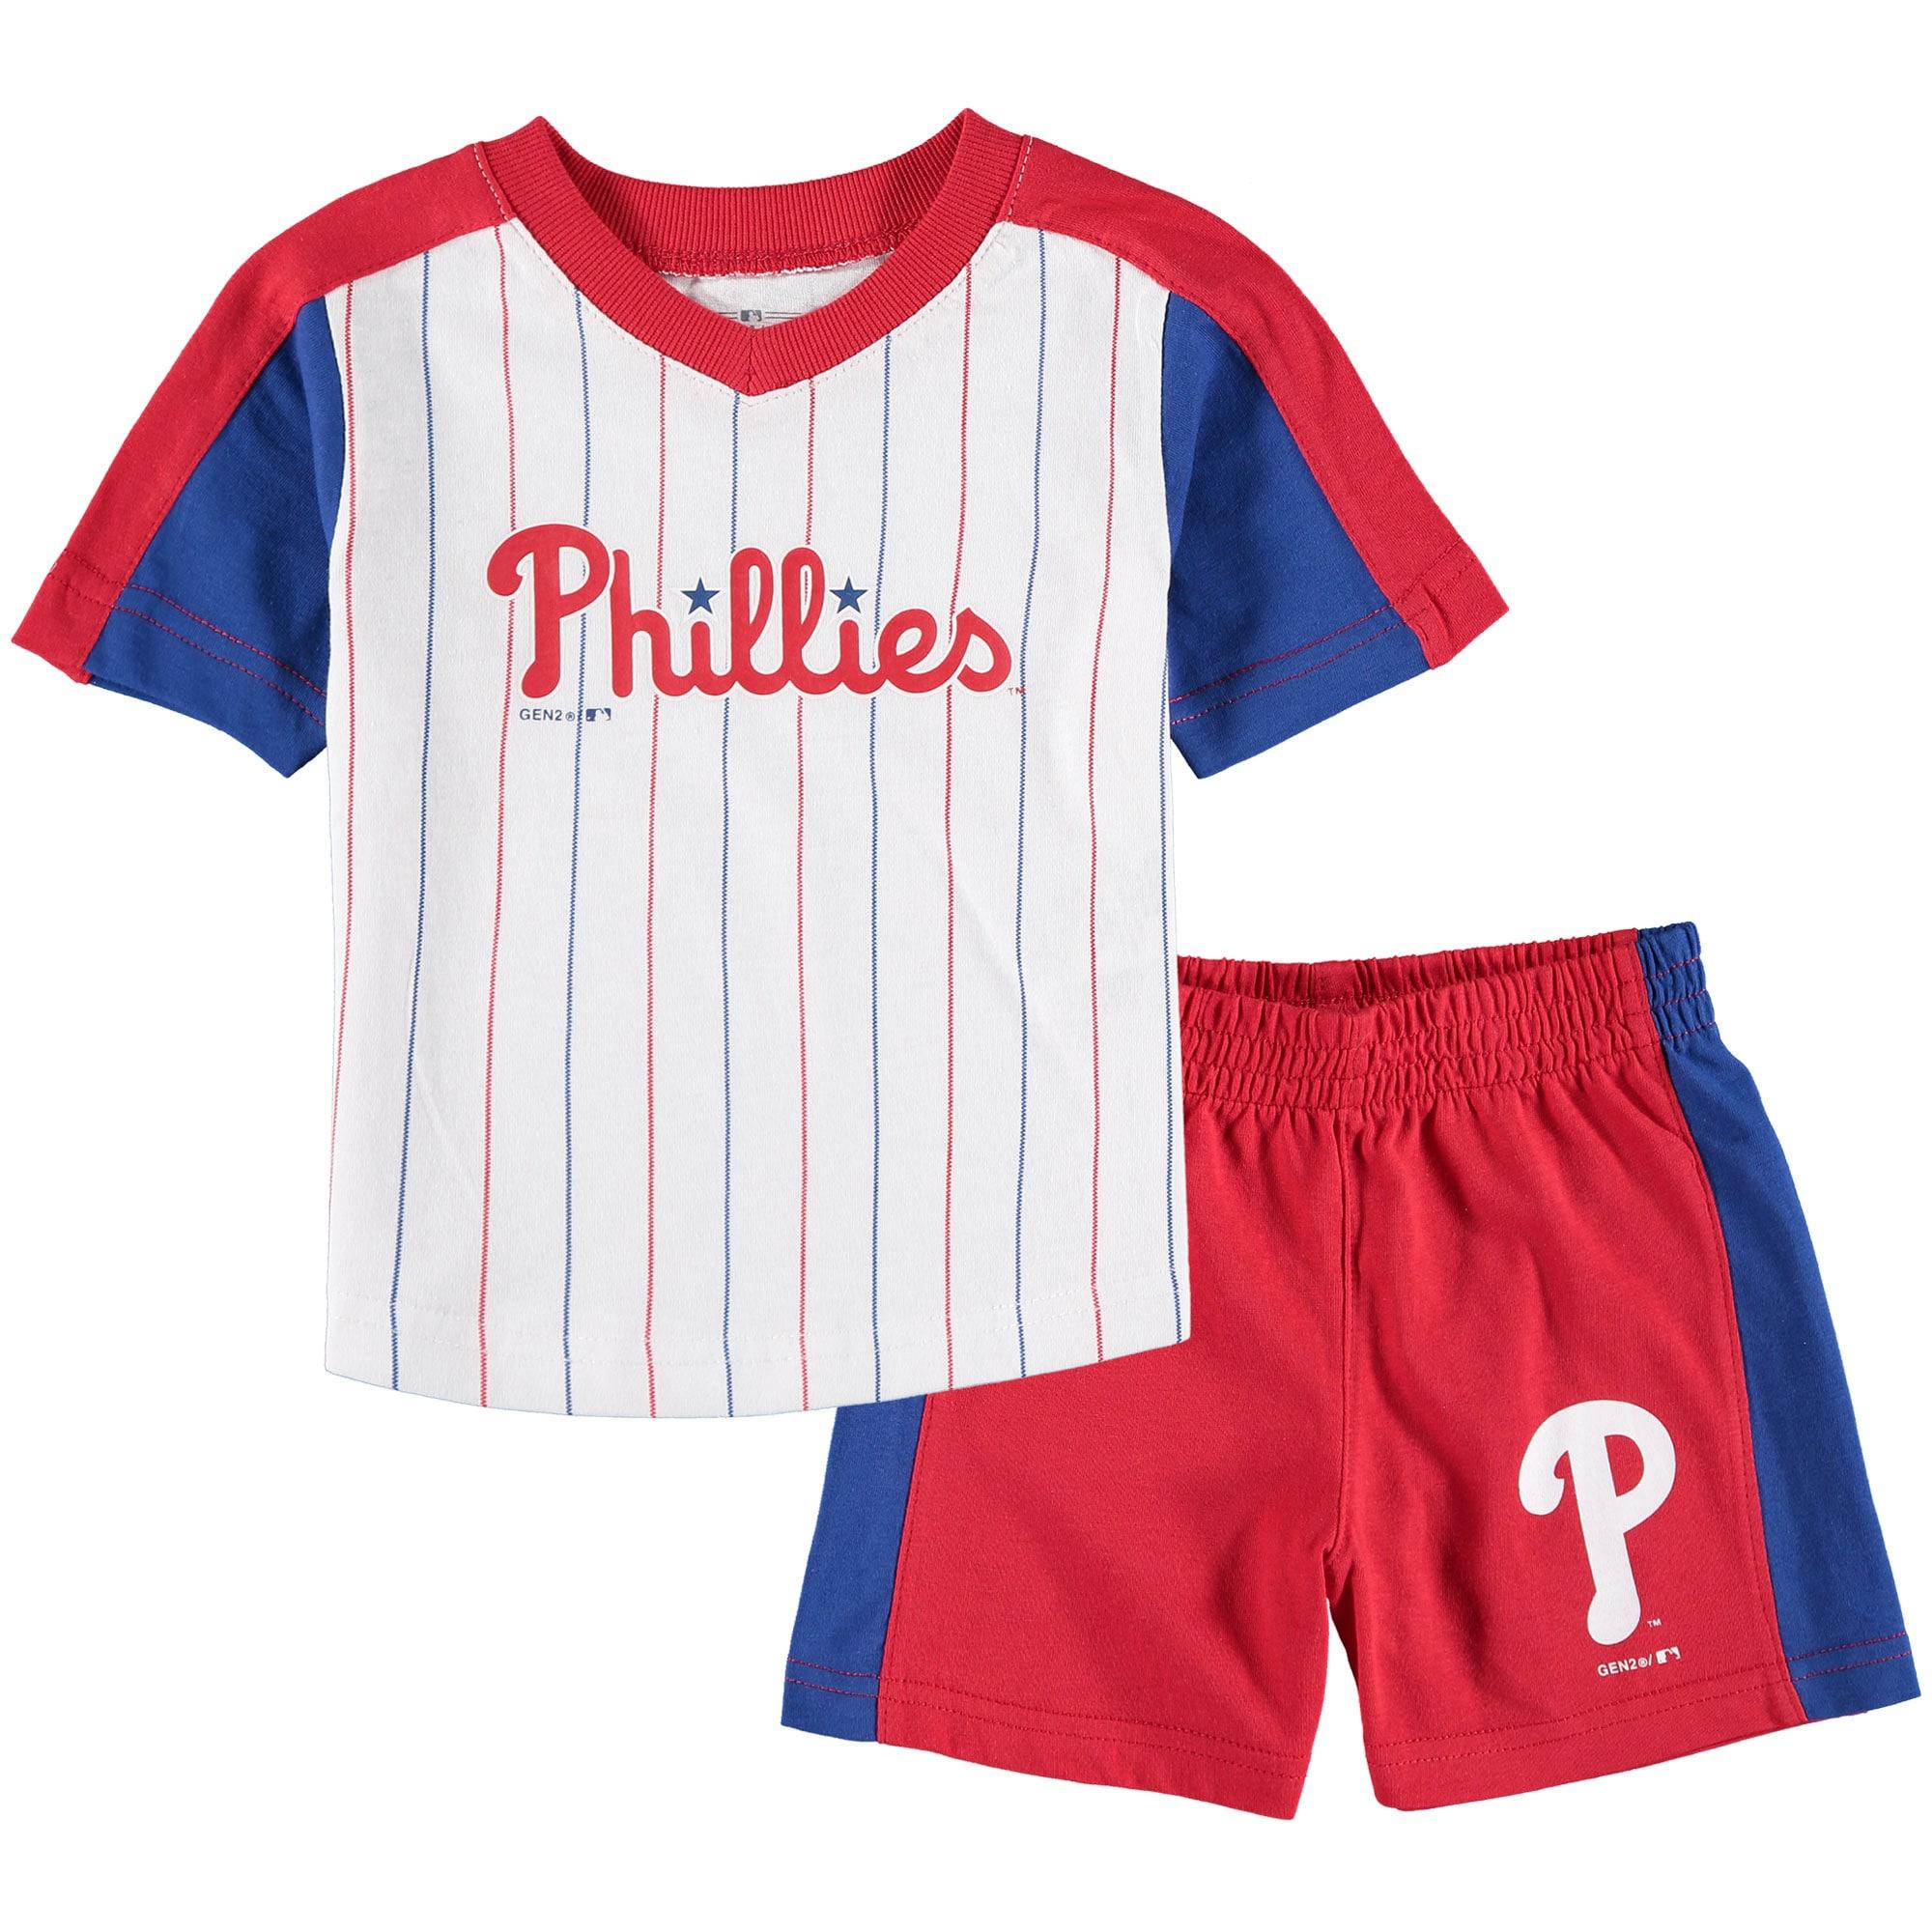 Philadelphia Phillies Infant The Lineup T-Shirt & Shorts Set - White/Red